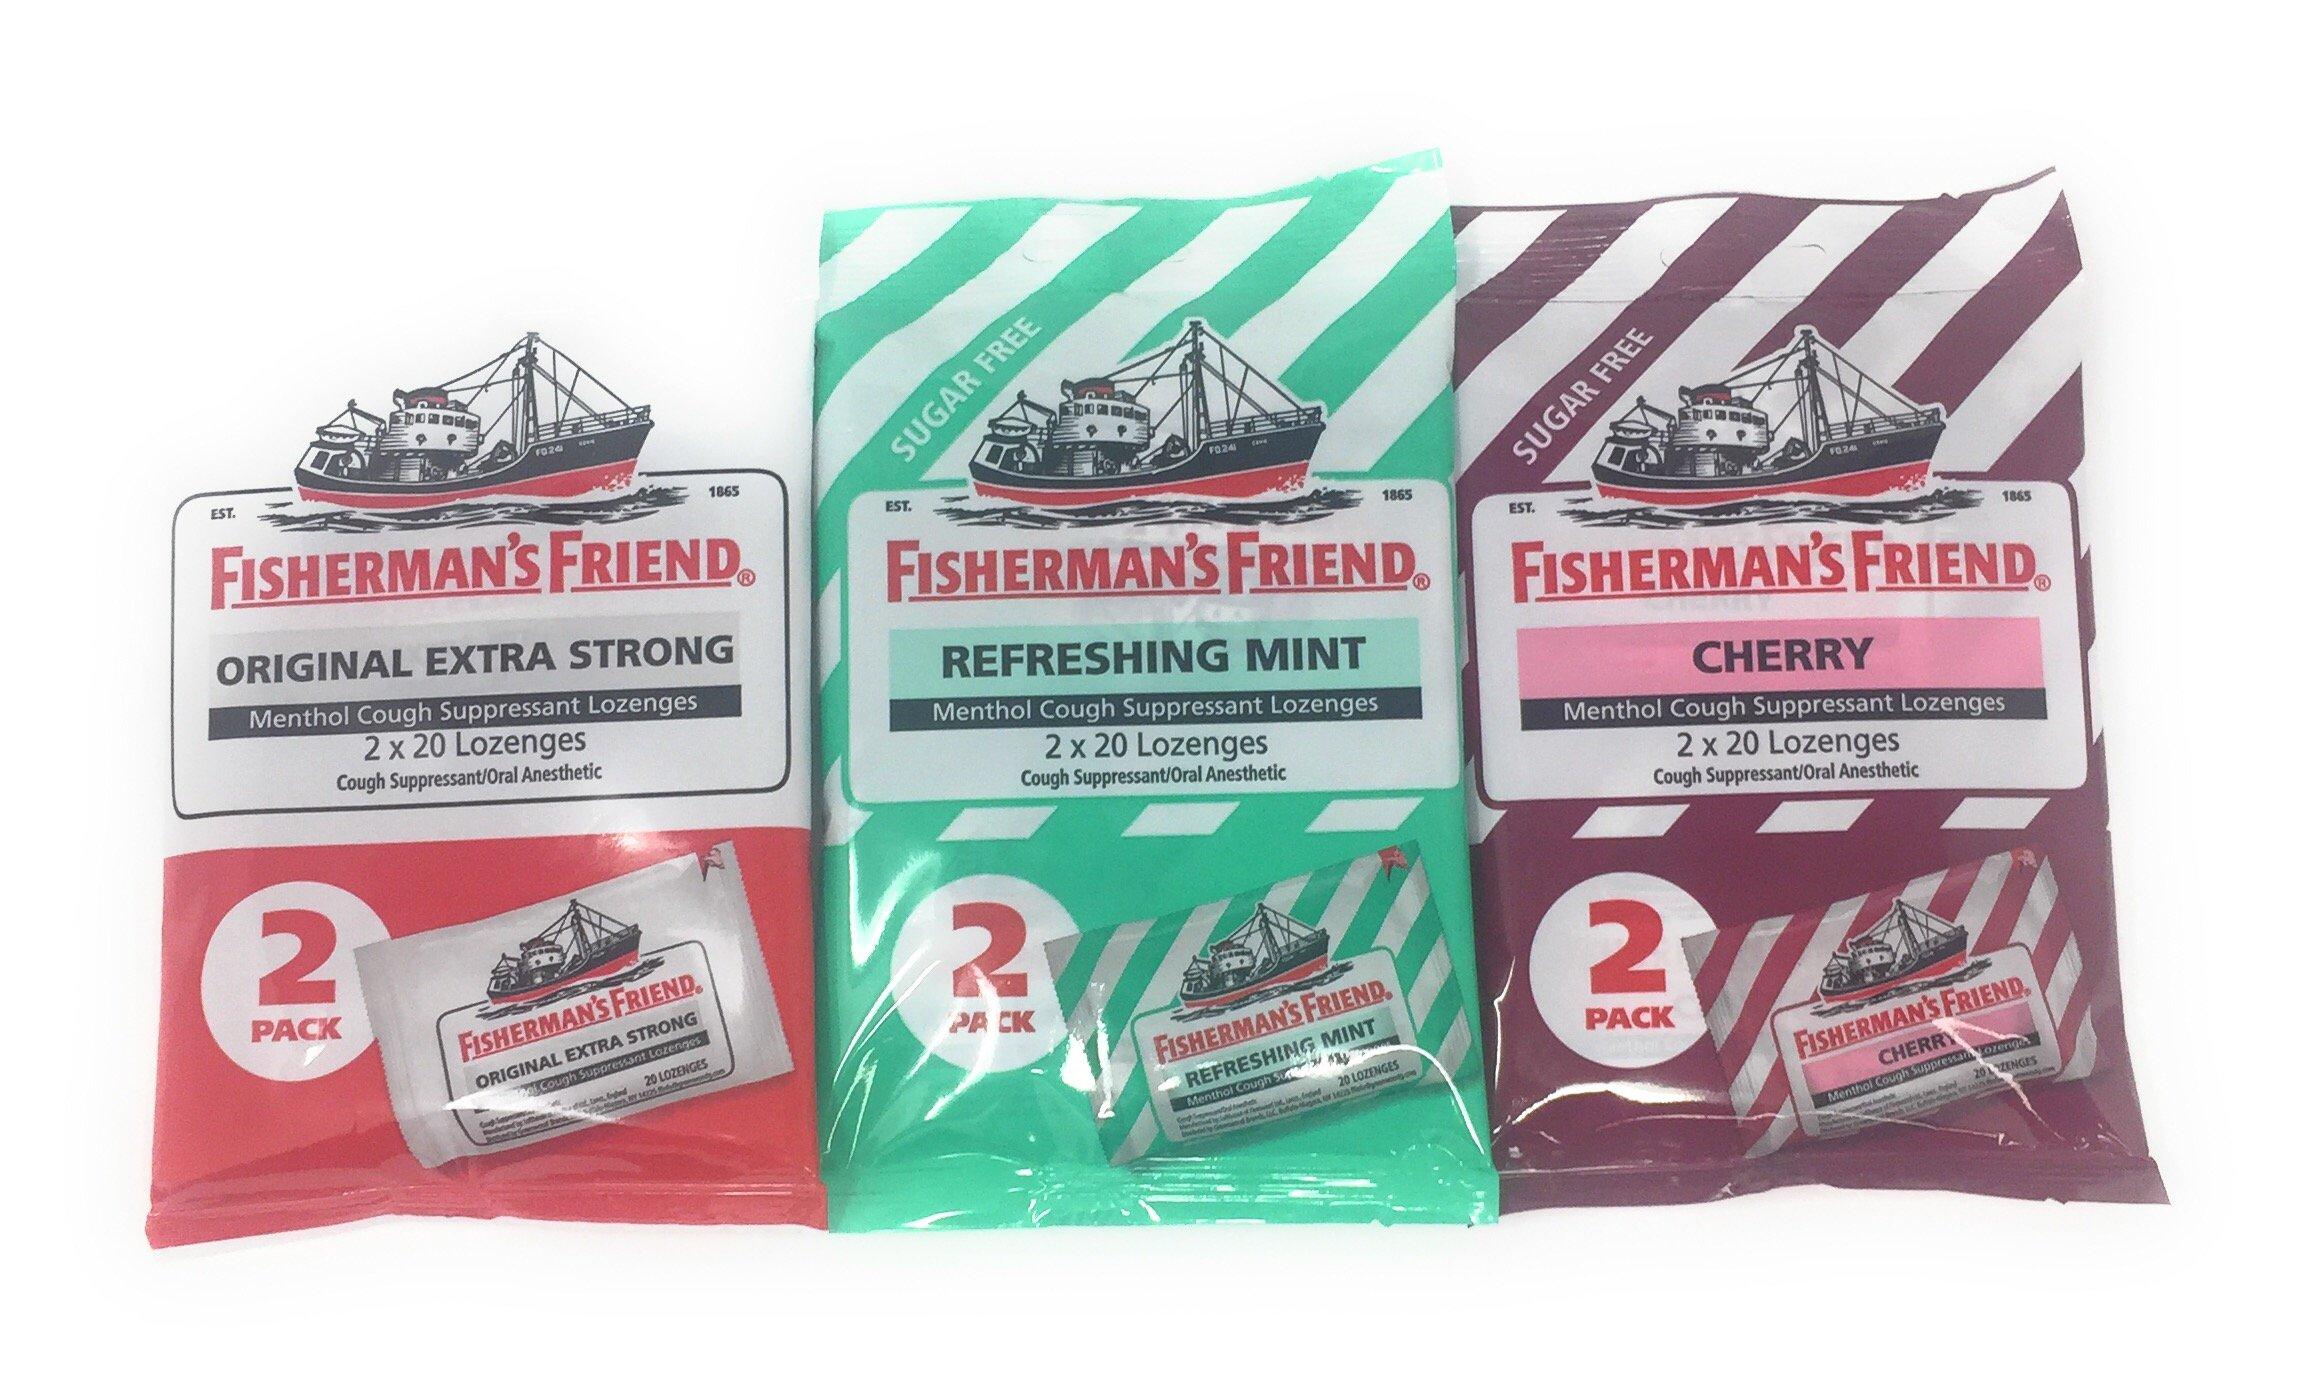 Fisherman's Friend Cough Suppressant Lozenges, 40-Count Bags Variety Set (1 of Each Flavor)